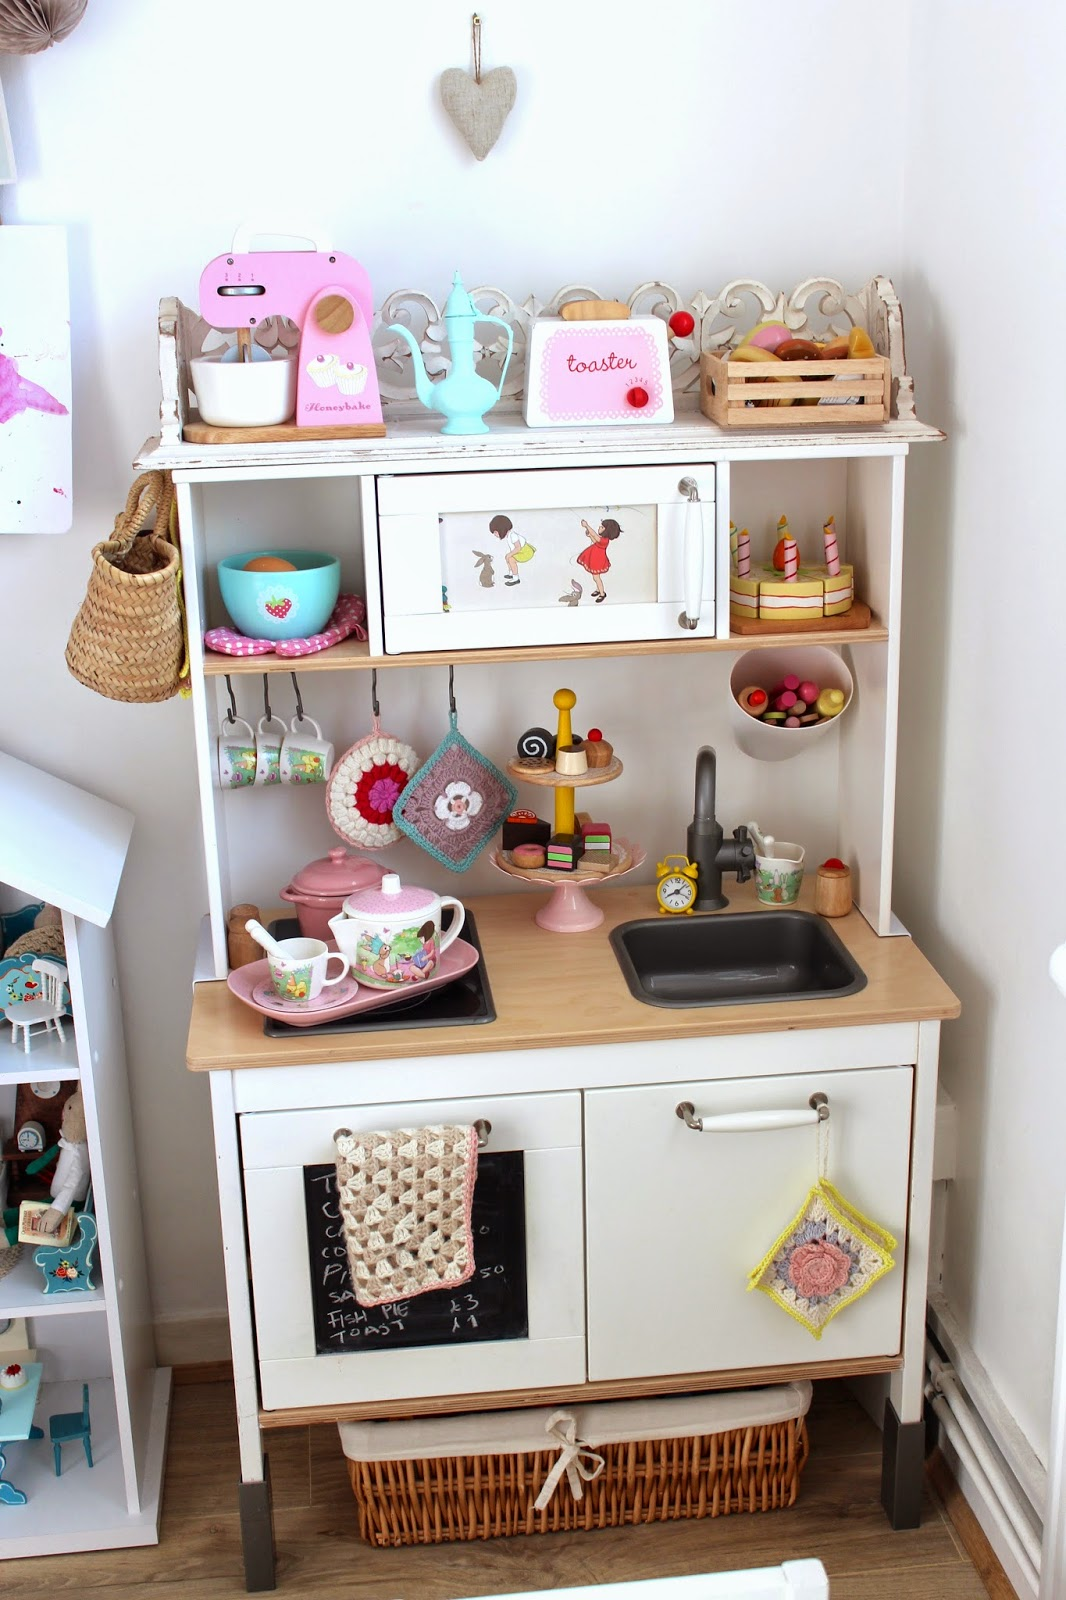 10 ikea hacks kuchni duktig pomys y i inspiracje hohonie bloguj. Black Bedroom Furniture Sets. Home Design Ideas